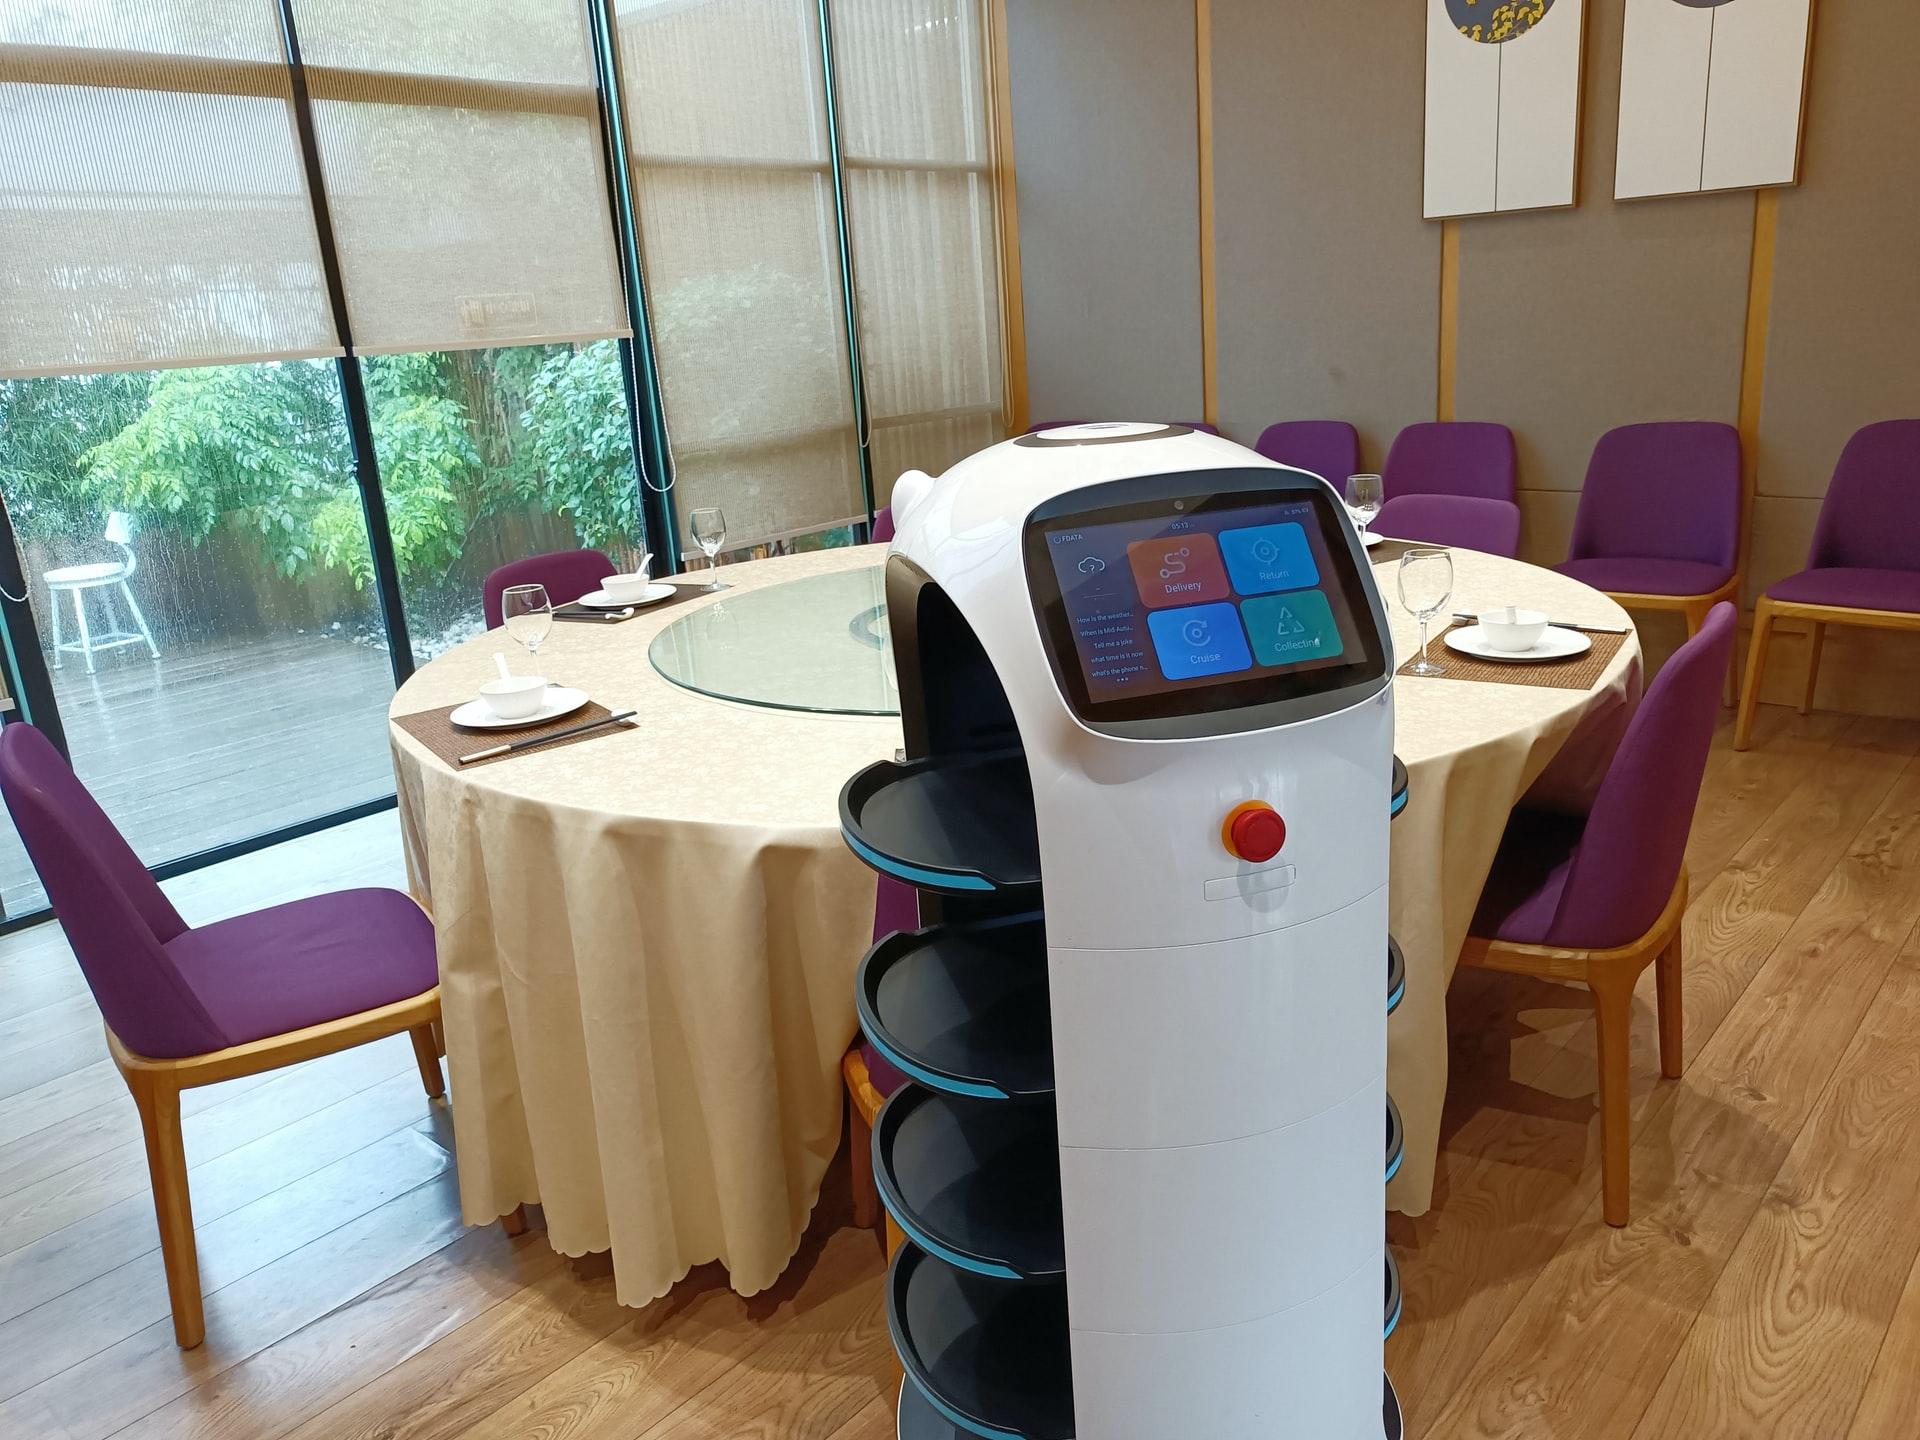 Roboter in Restaurants – die neue Generation Kellner